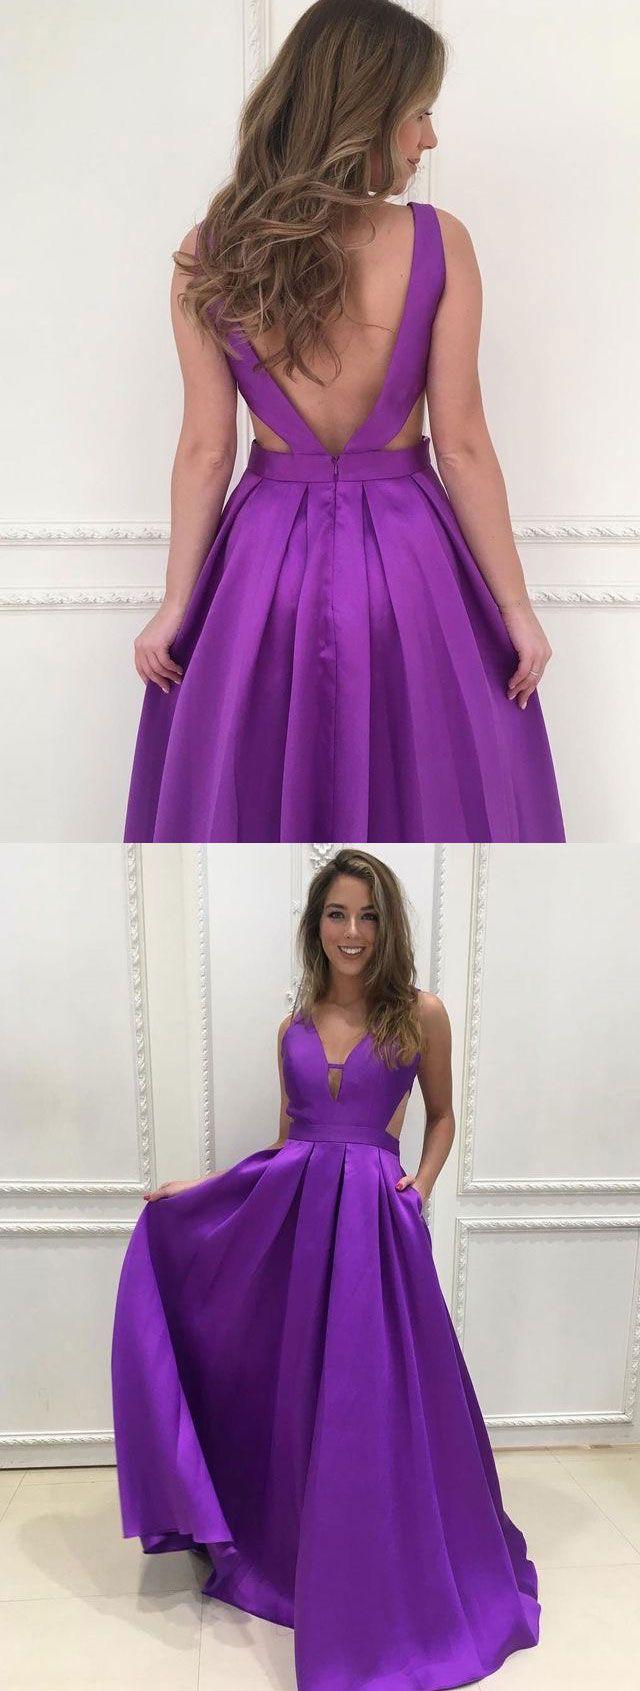 Long purple prom dresses womenus prom dresses backless prom